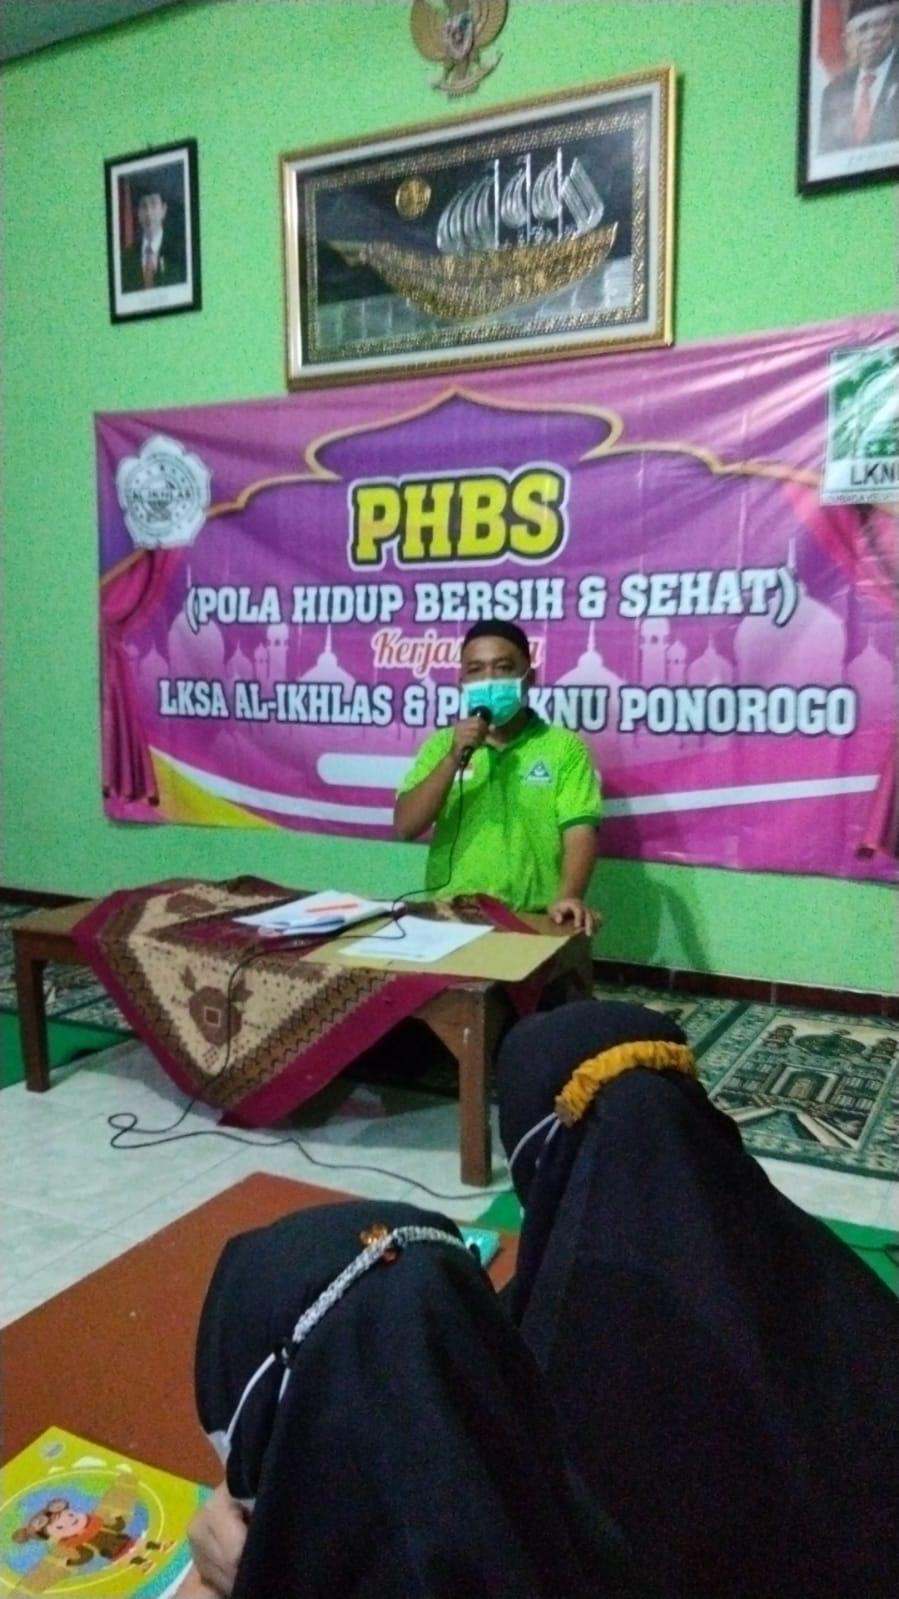 Santoso Fungsionaris LKNU Ponorogo memaparkan pentingnya PHBS di lingkungan asrama LKSA Al-Ikhlas